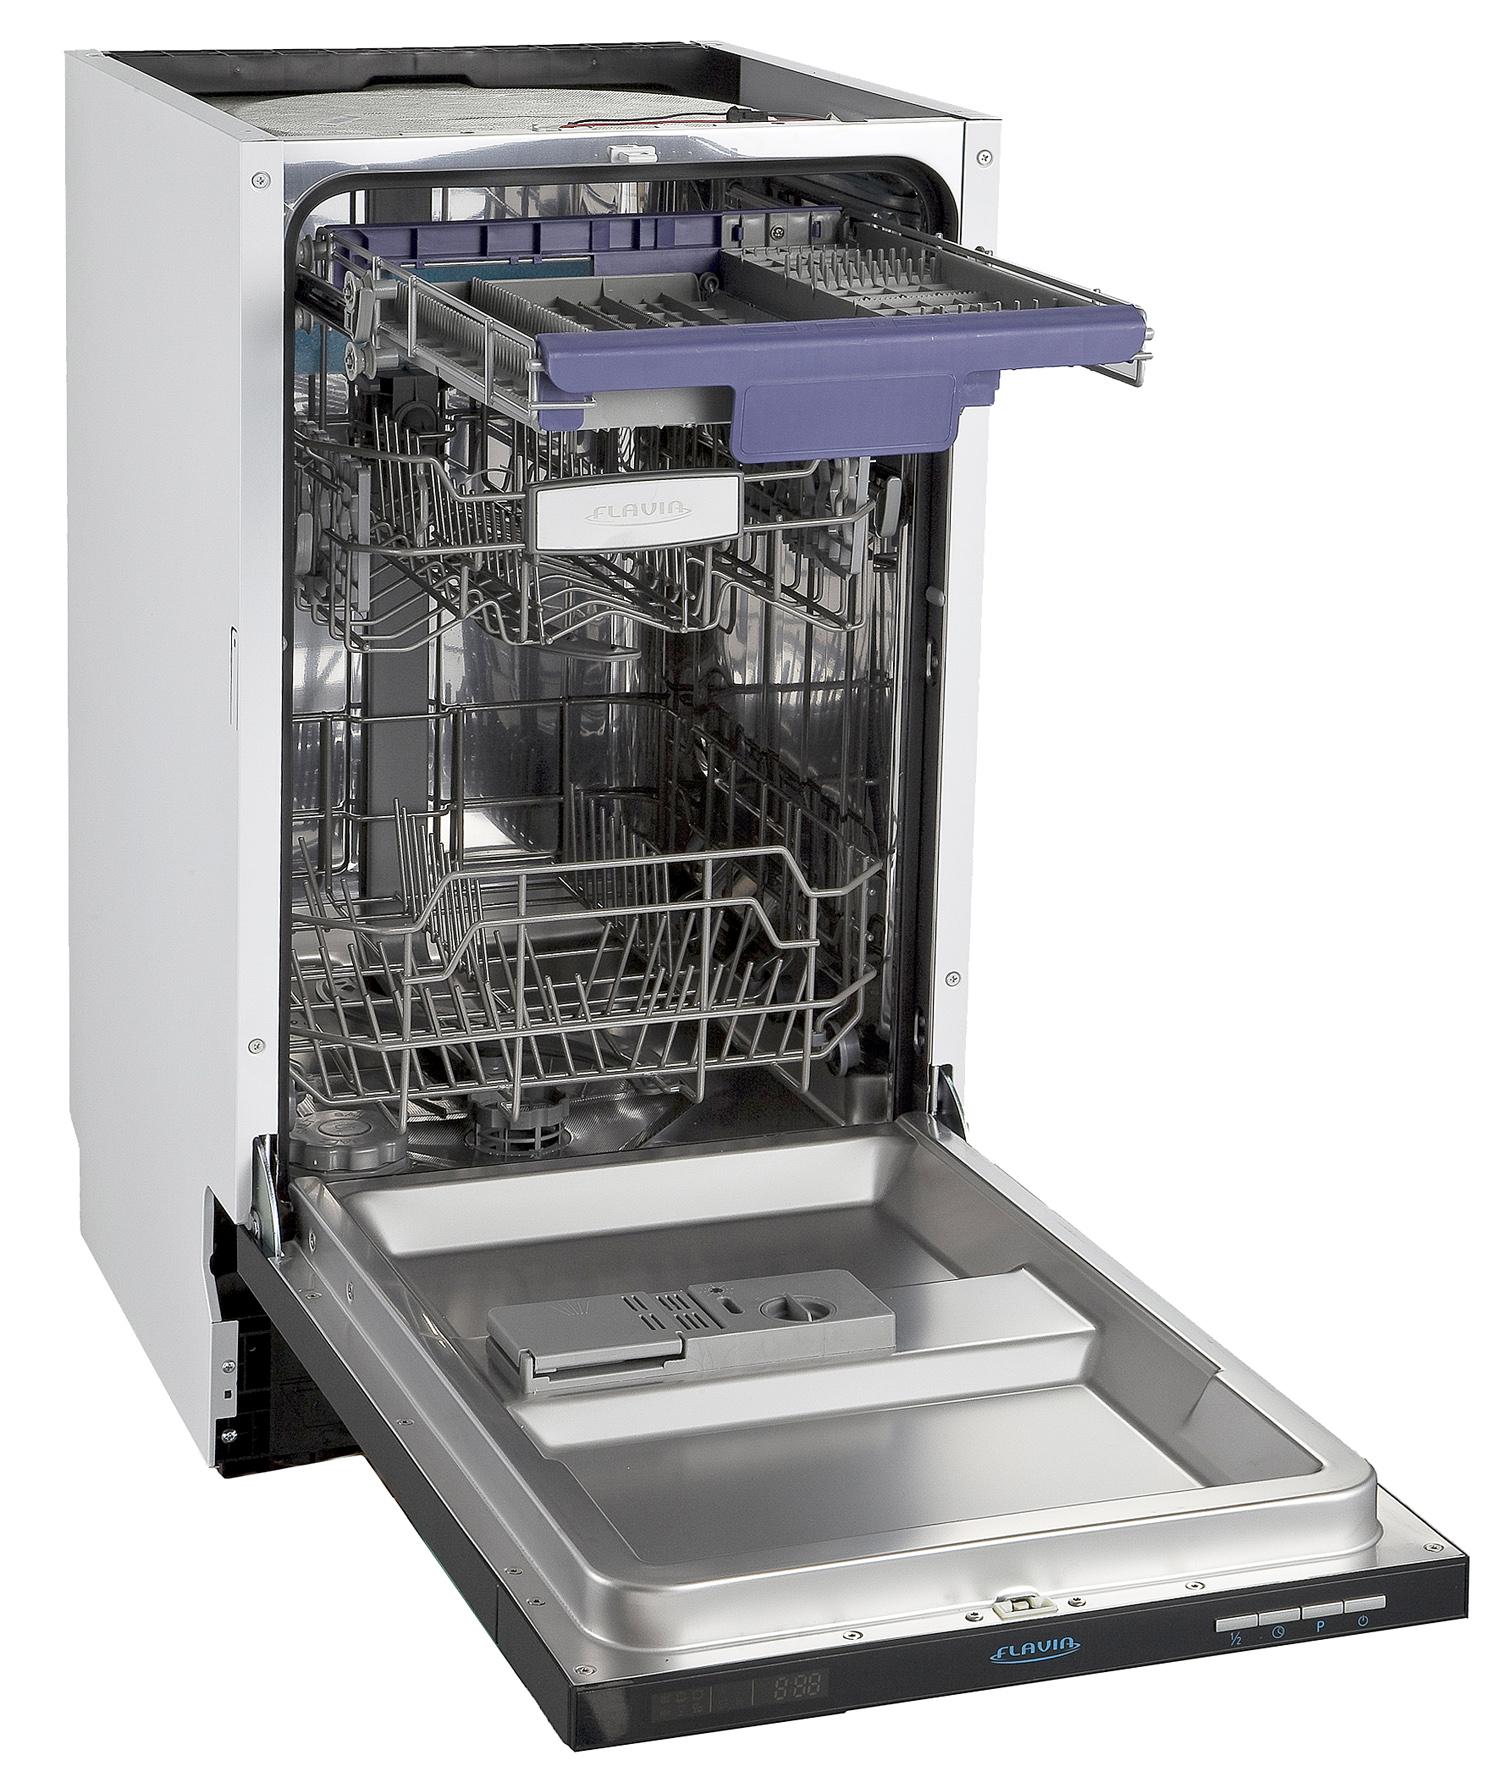 Посудомоечная машина Flavia Real Brand Technics 13190.000